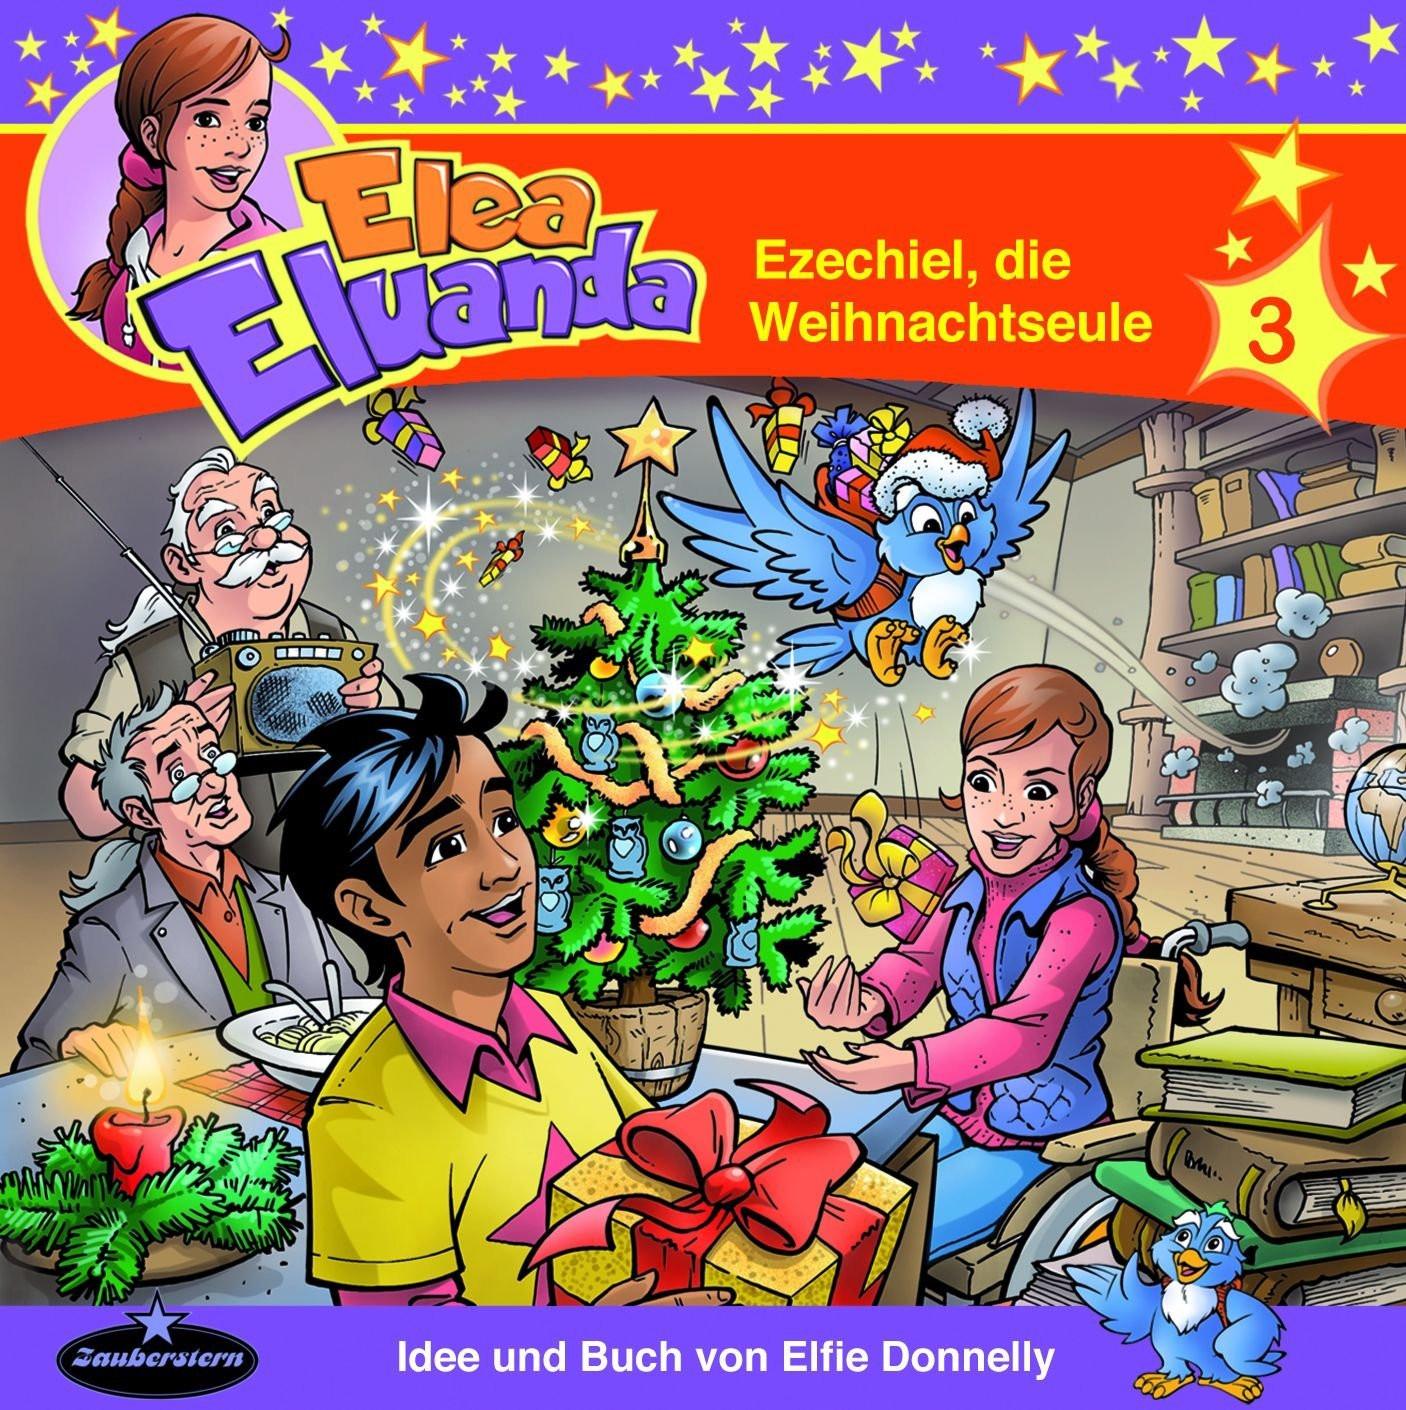 Elea Eluanda - Folge 3: Ezechiel, die Weihnachtseule